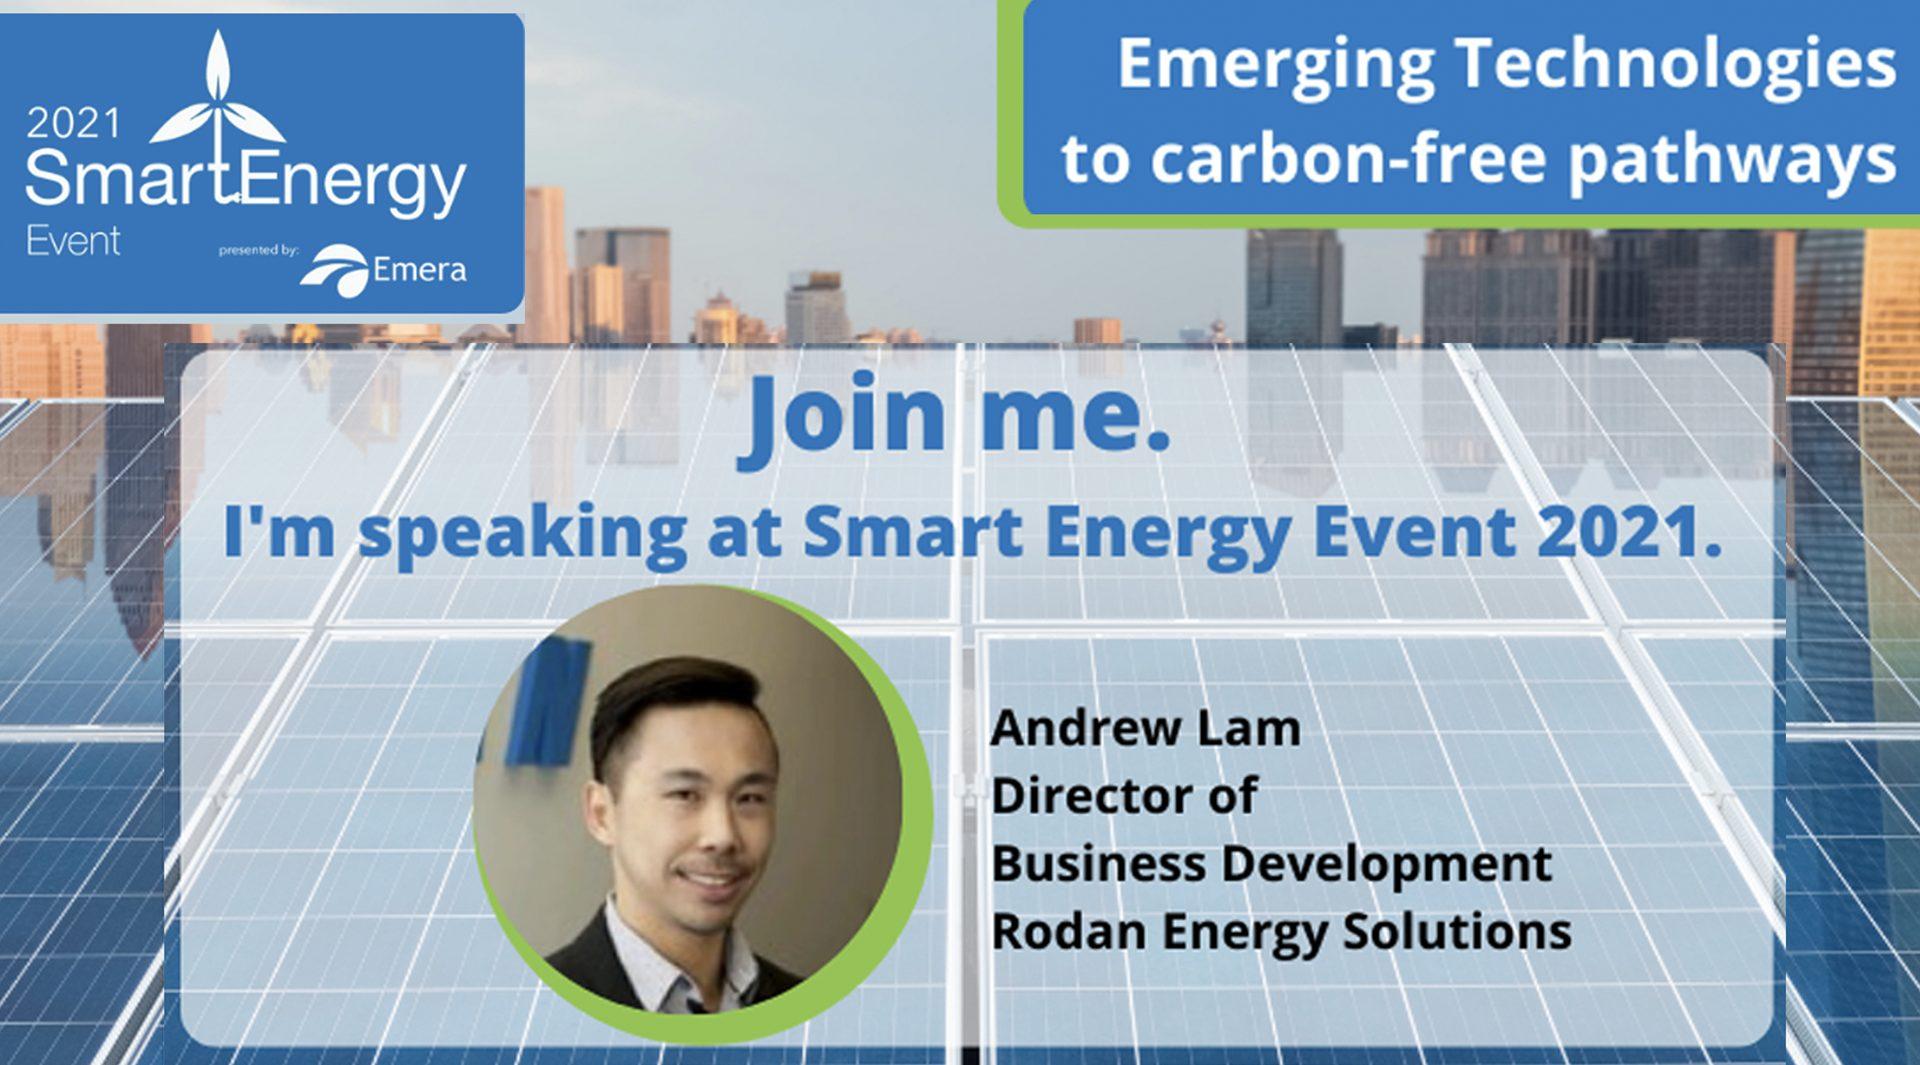 Smart Energy Event 2021